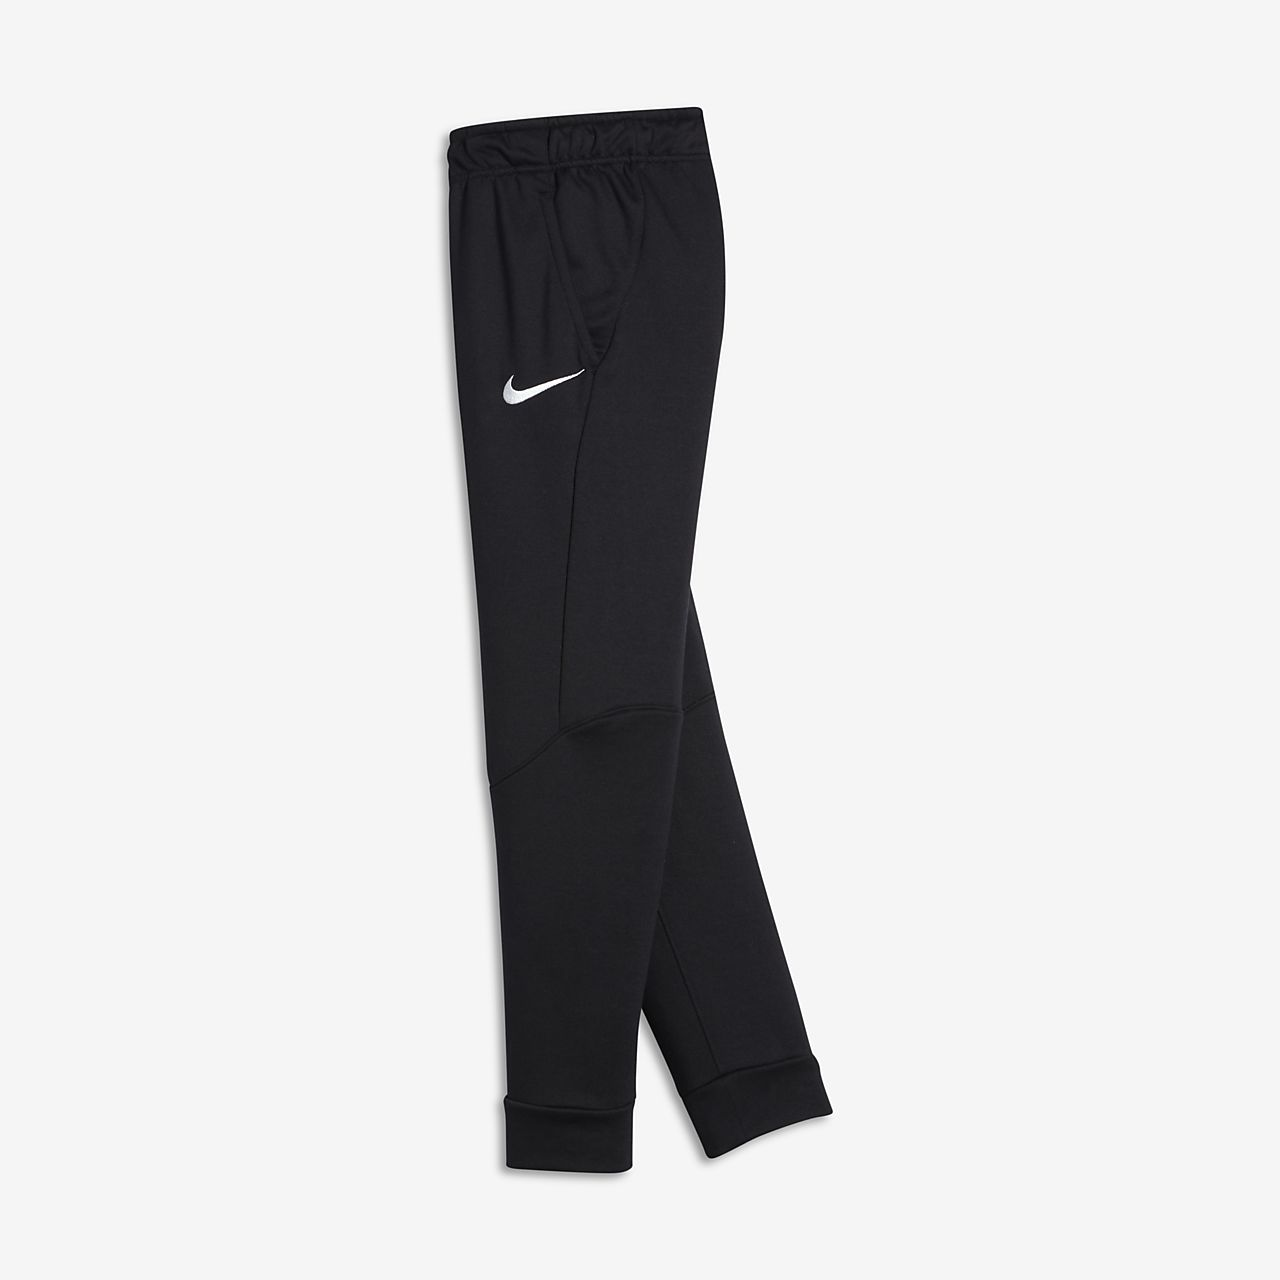 caeb6c22e Nike Dri-FIT Big Kids' Training Pants. Nike.com